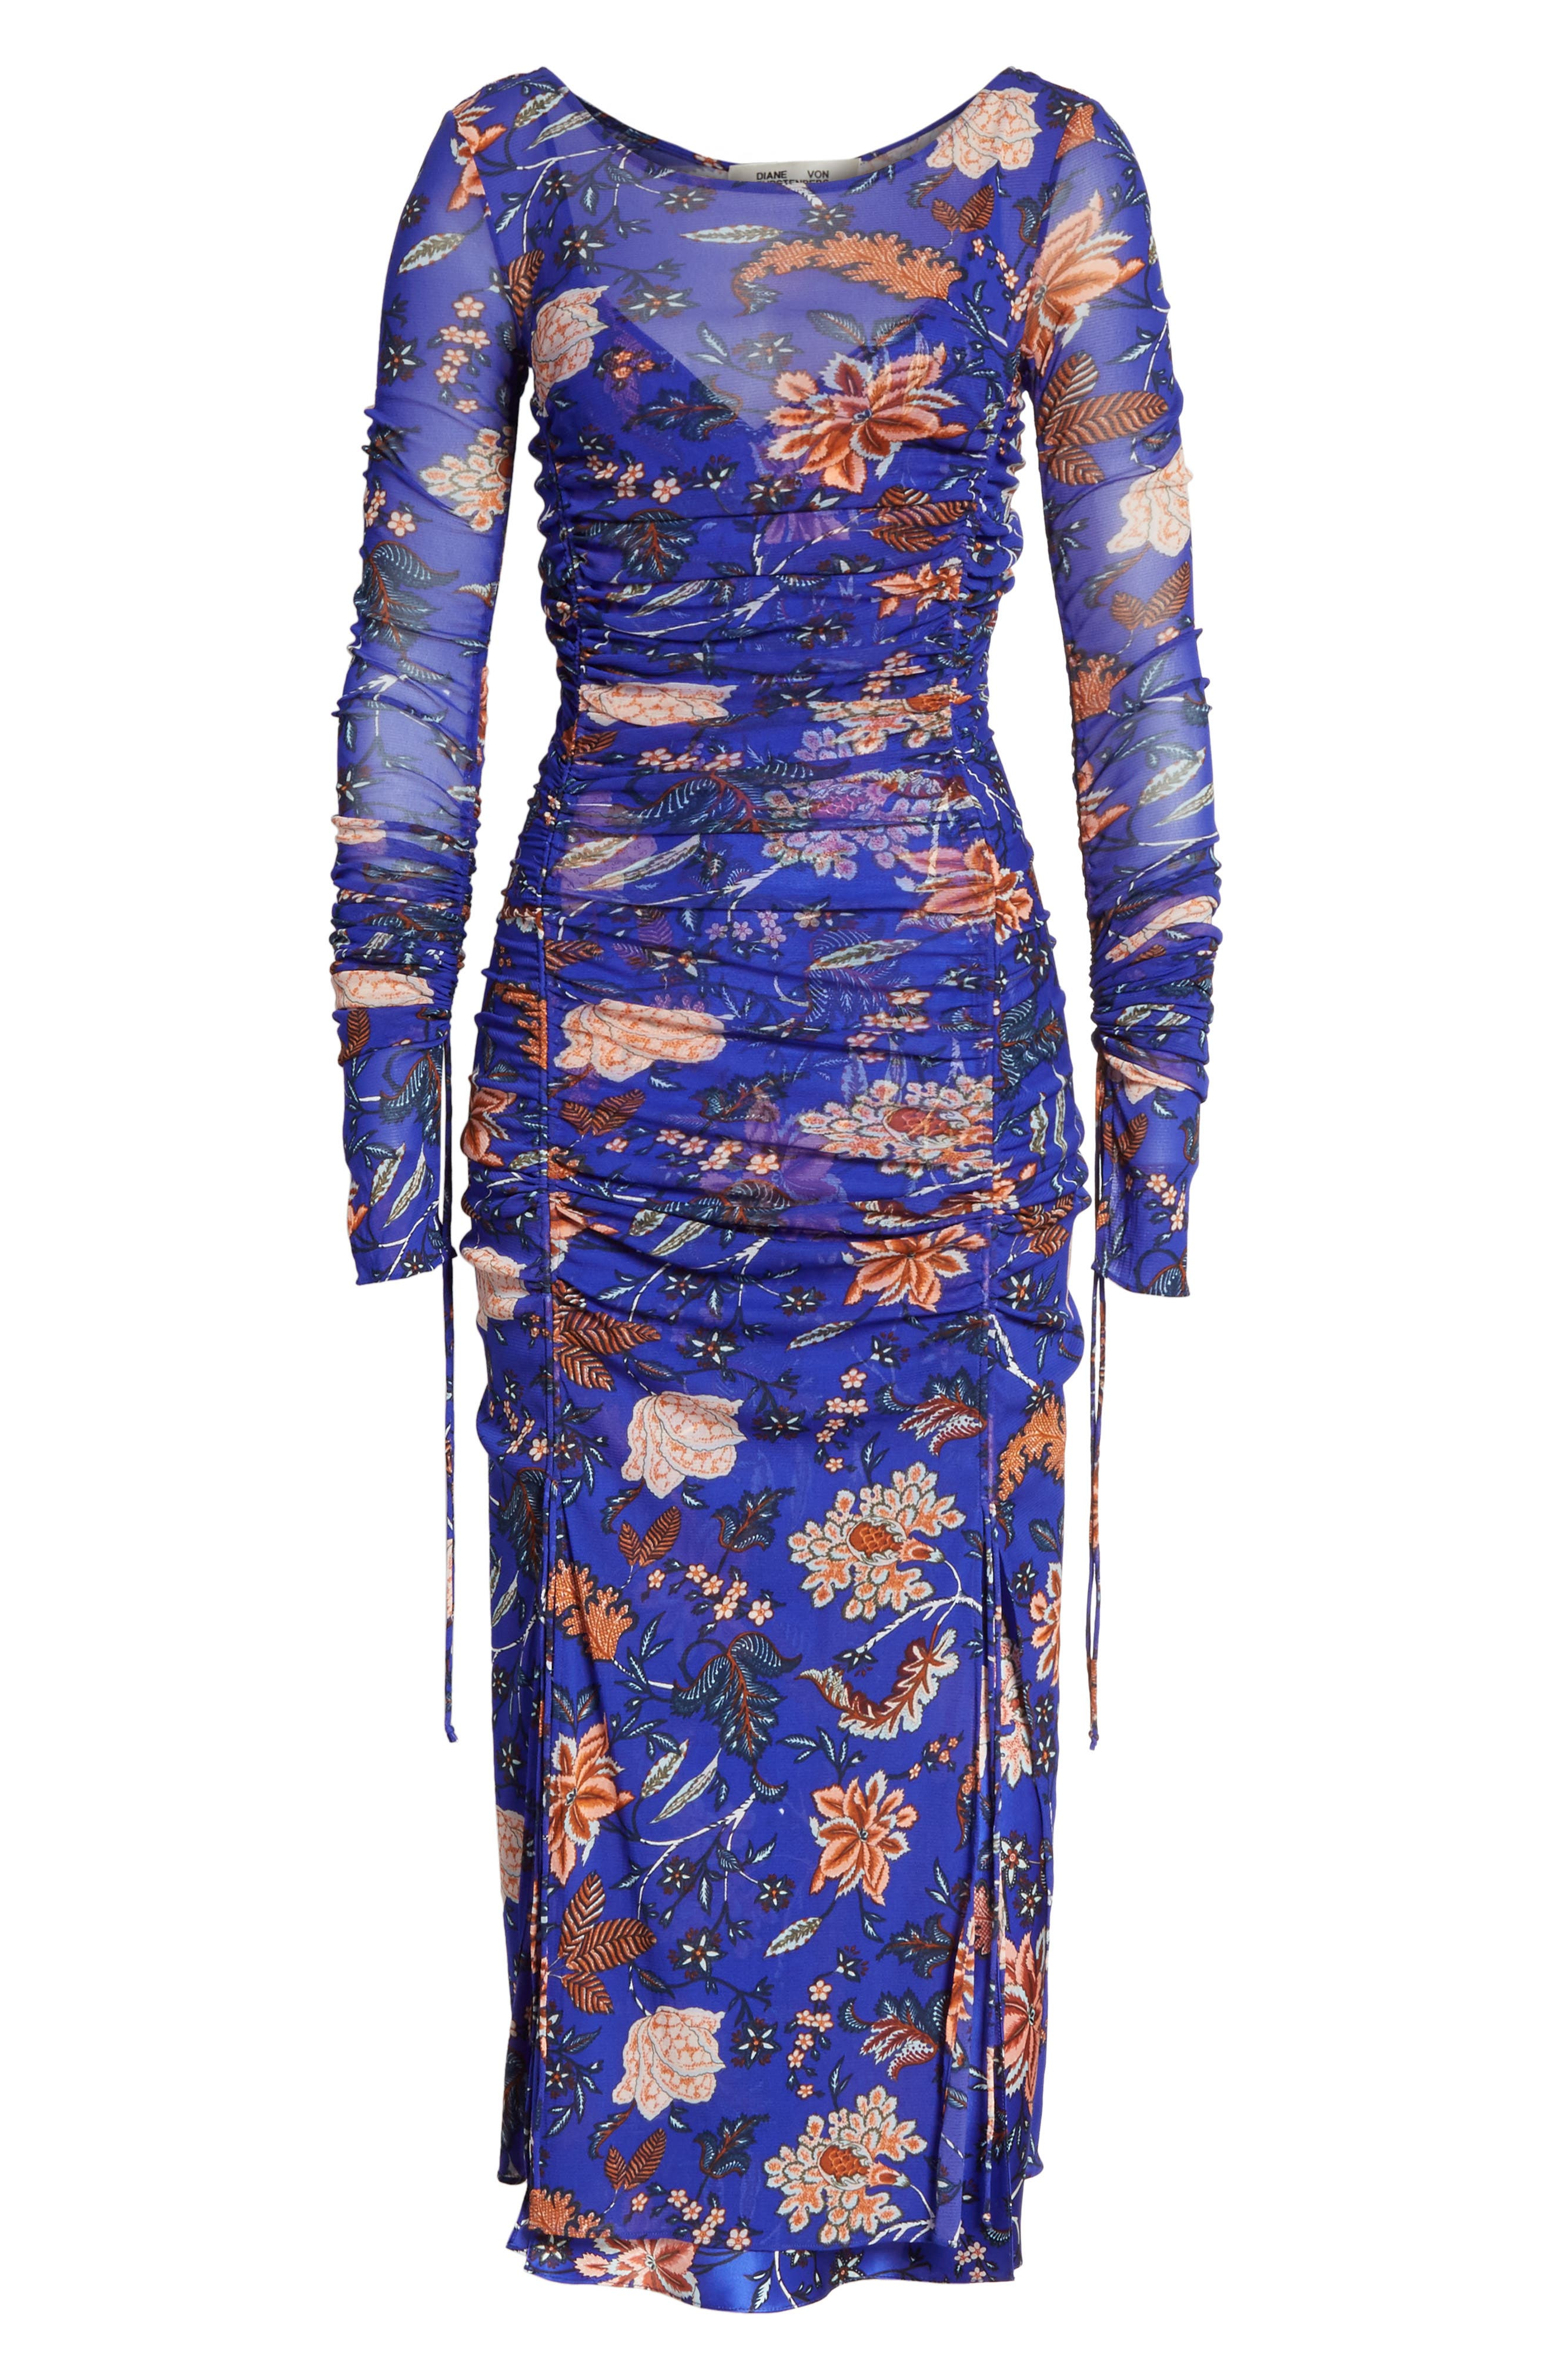 Diane von Furstenberg Mesh Overlay Floral Midi Dress,                             Alternate thumbnail 6, color,                             533